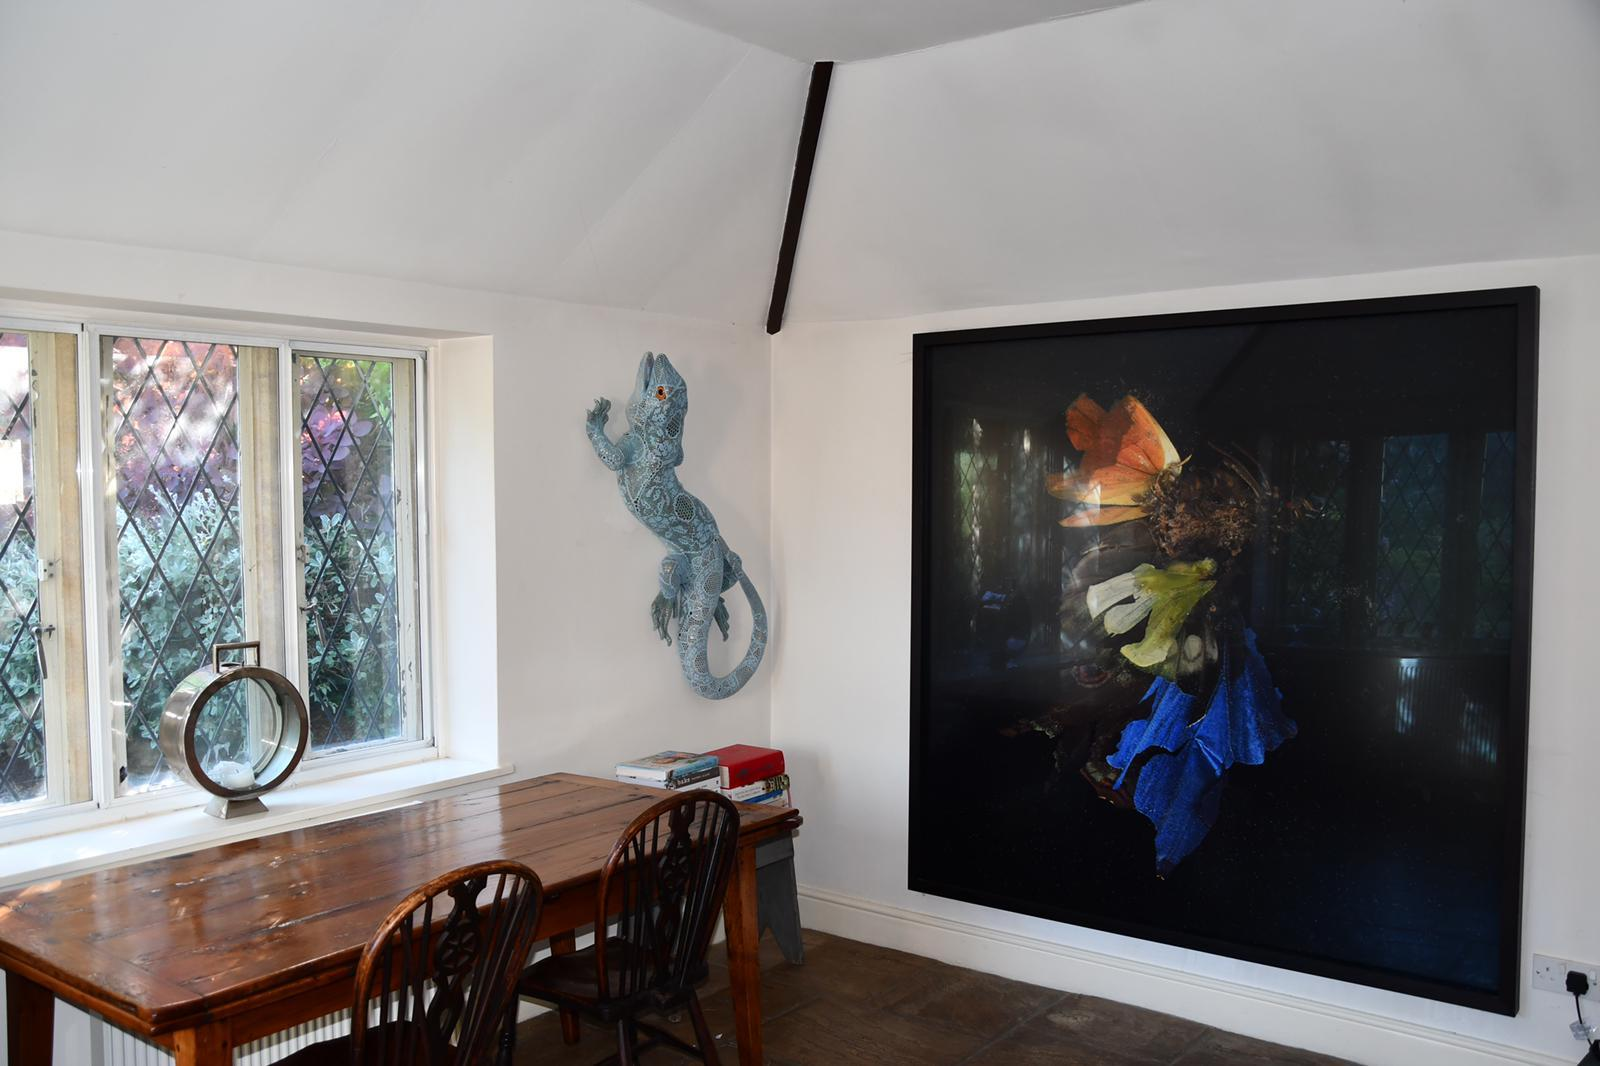 Art by Joanna Vasconcelos and Mat Collishaw in the home of Matt Carey-Williams